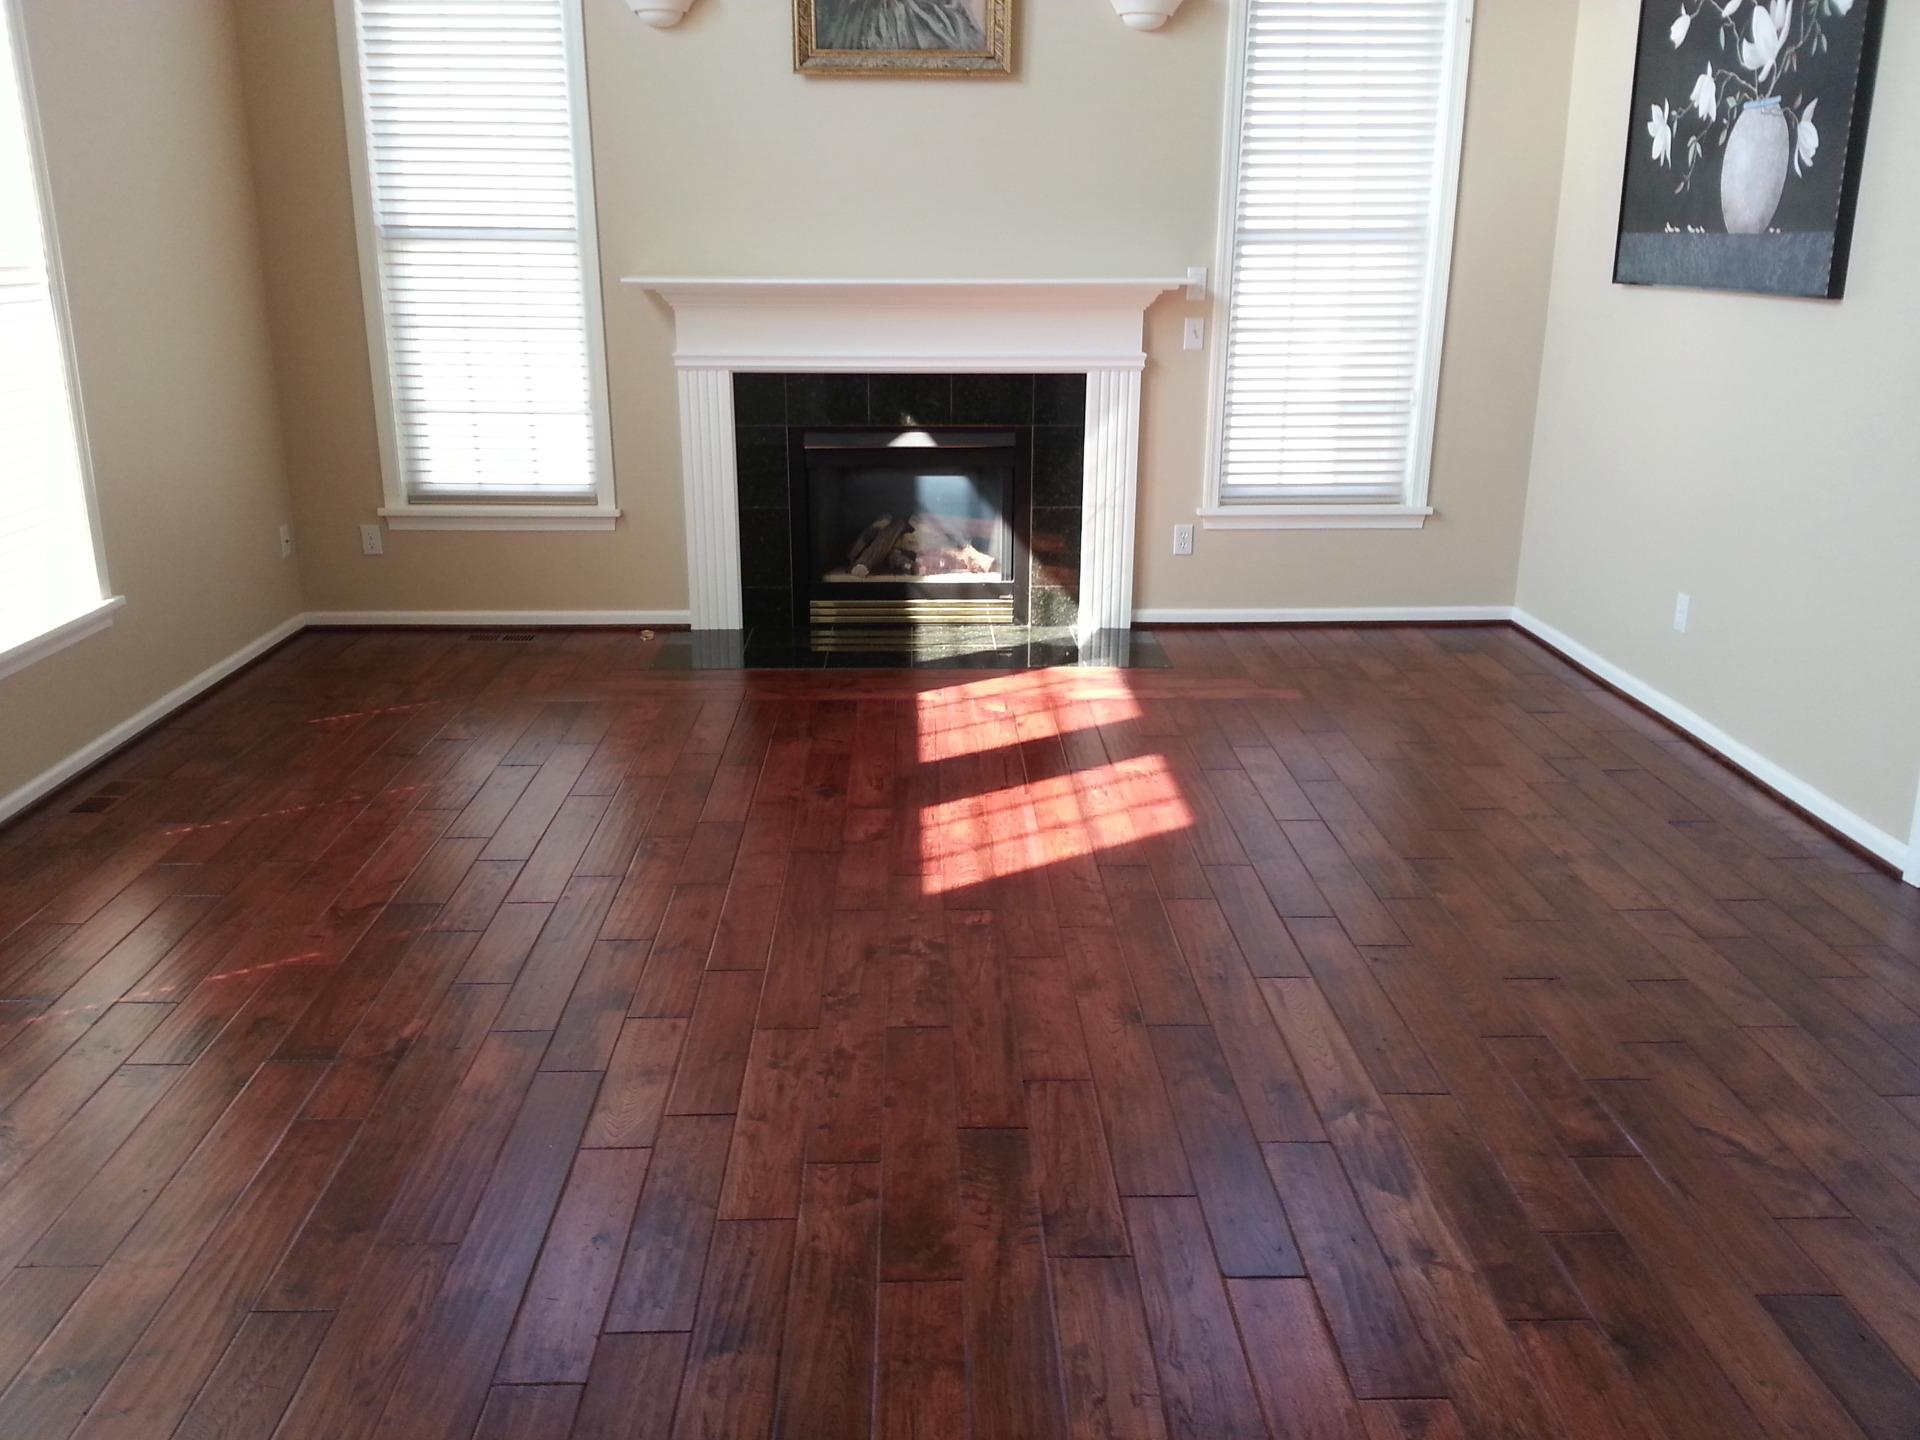 Charming Finished On Site Vs. Pre Finished Hardwood Floors